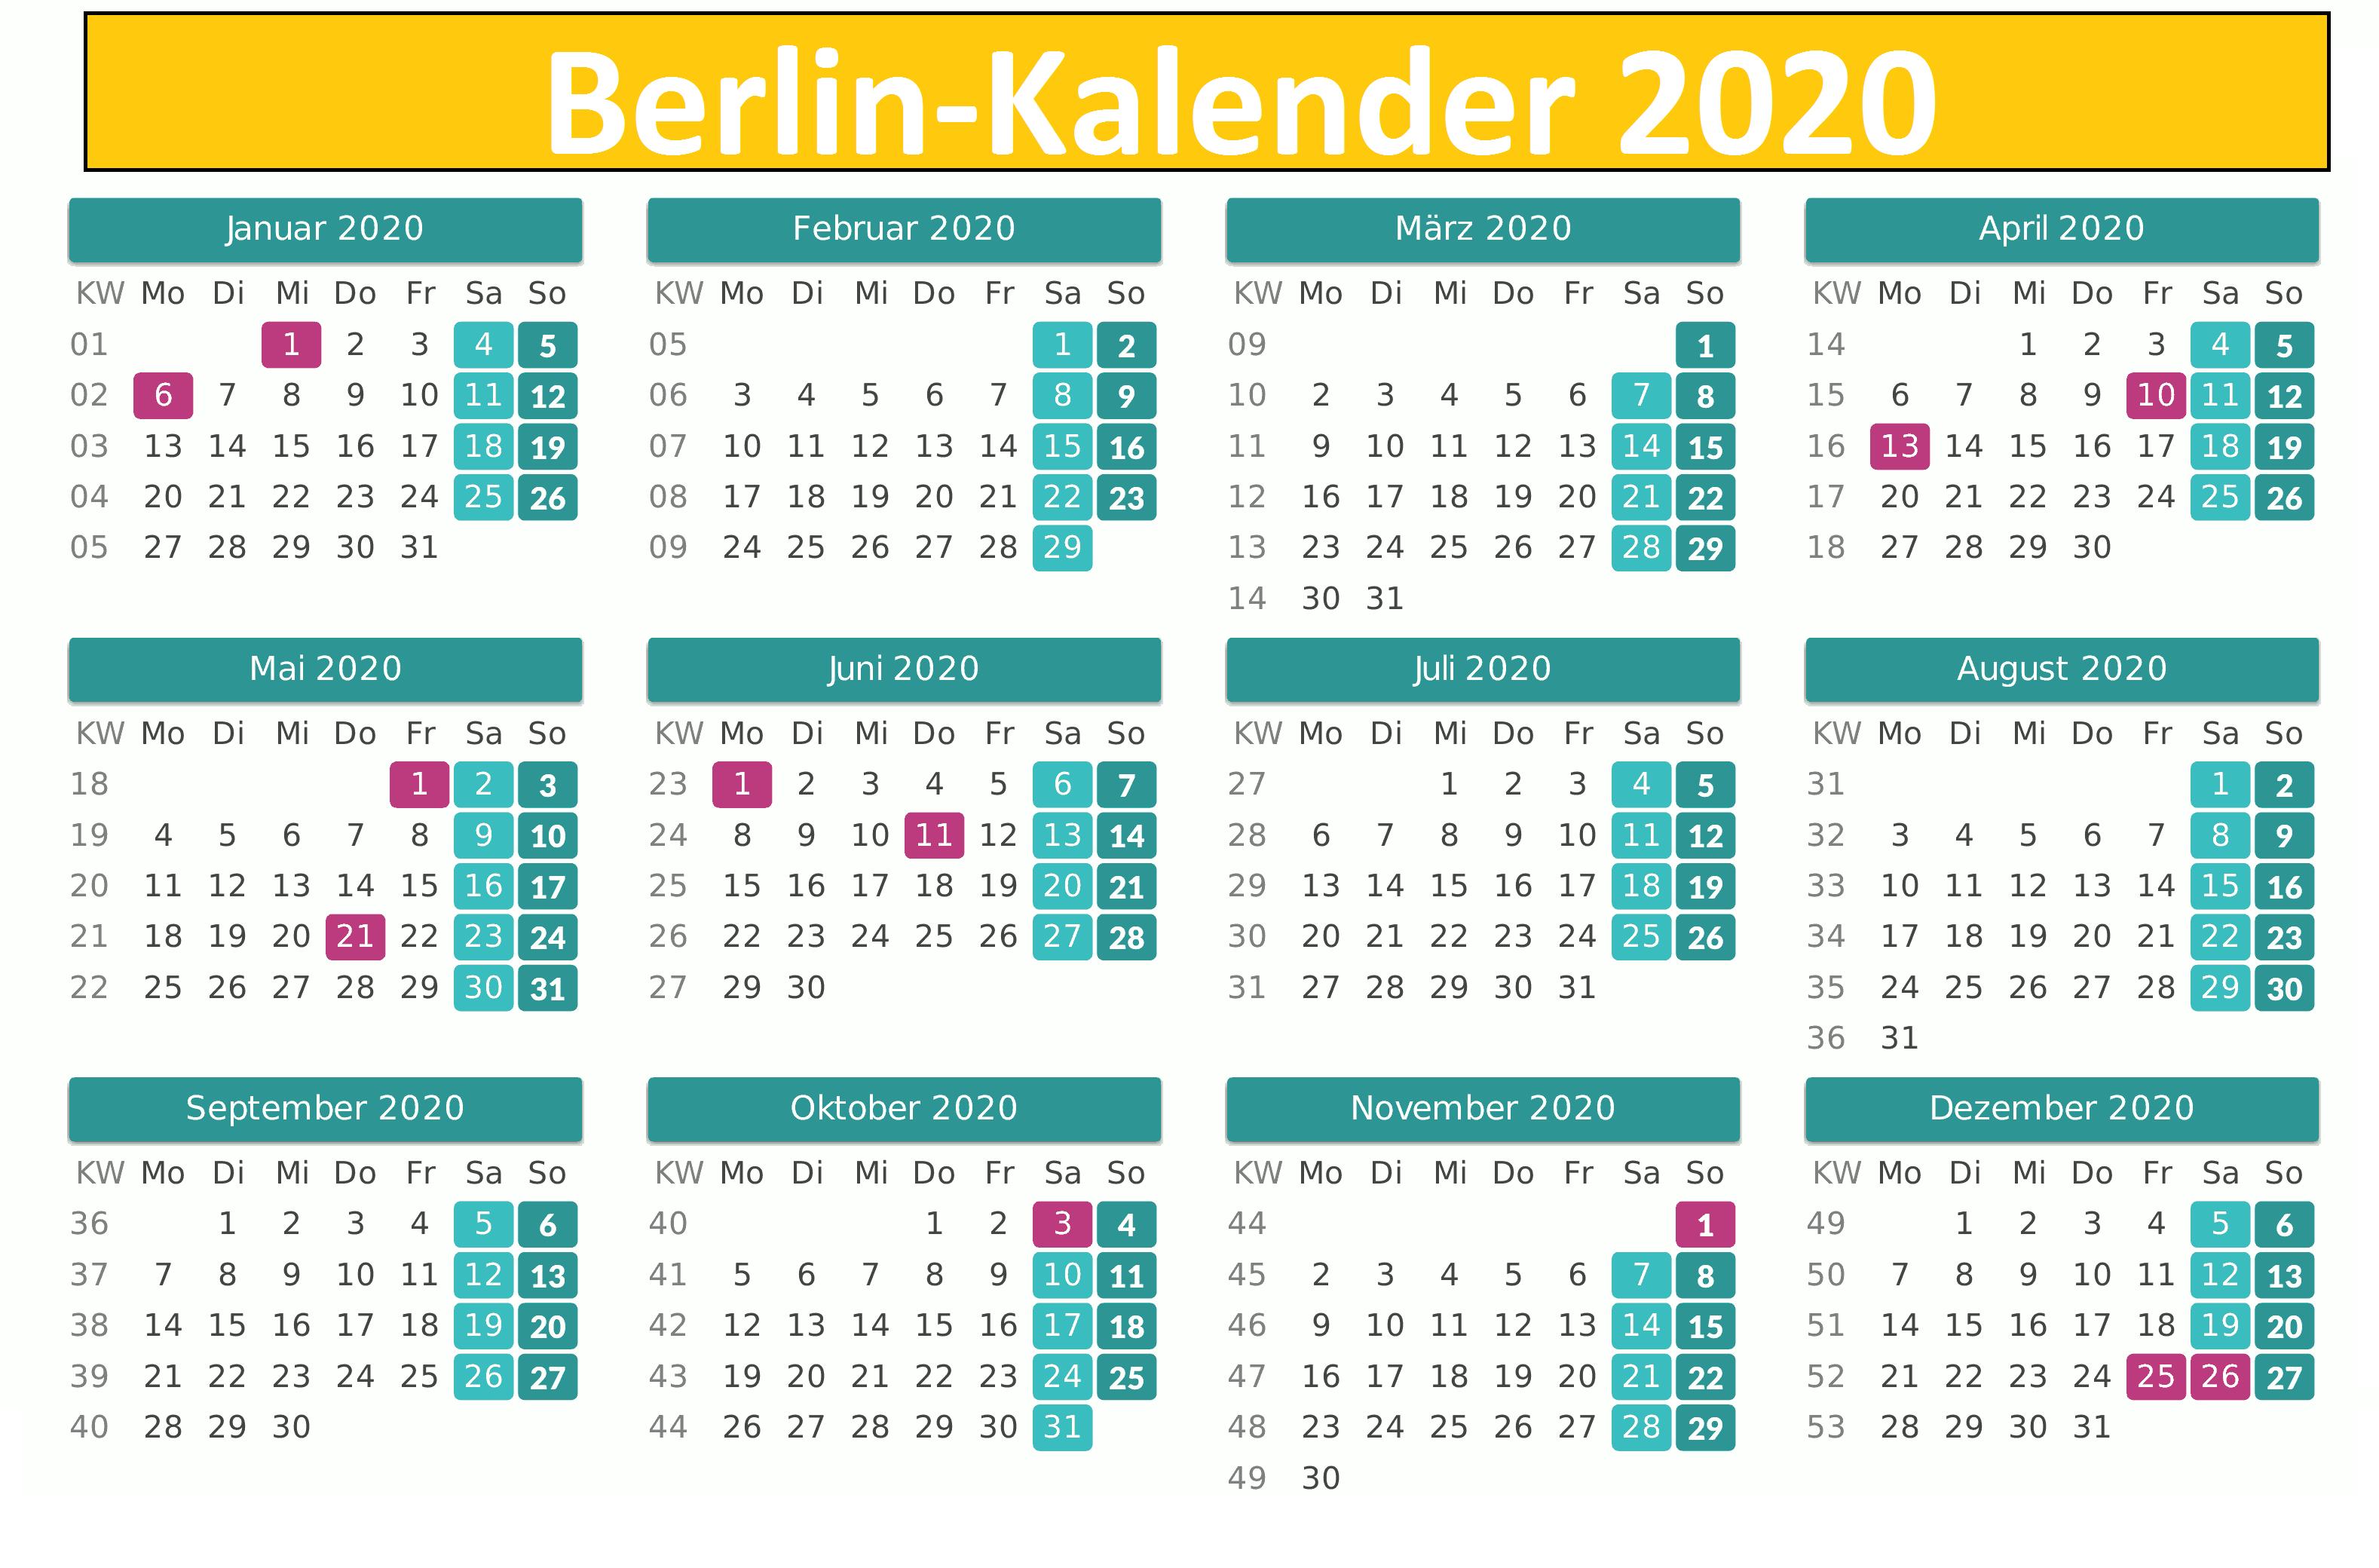 Wann Sind Die Sommerferien Berlin 2020?